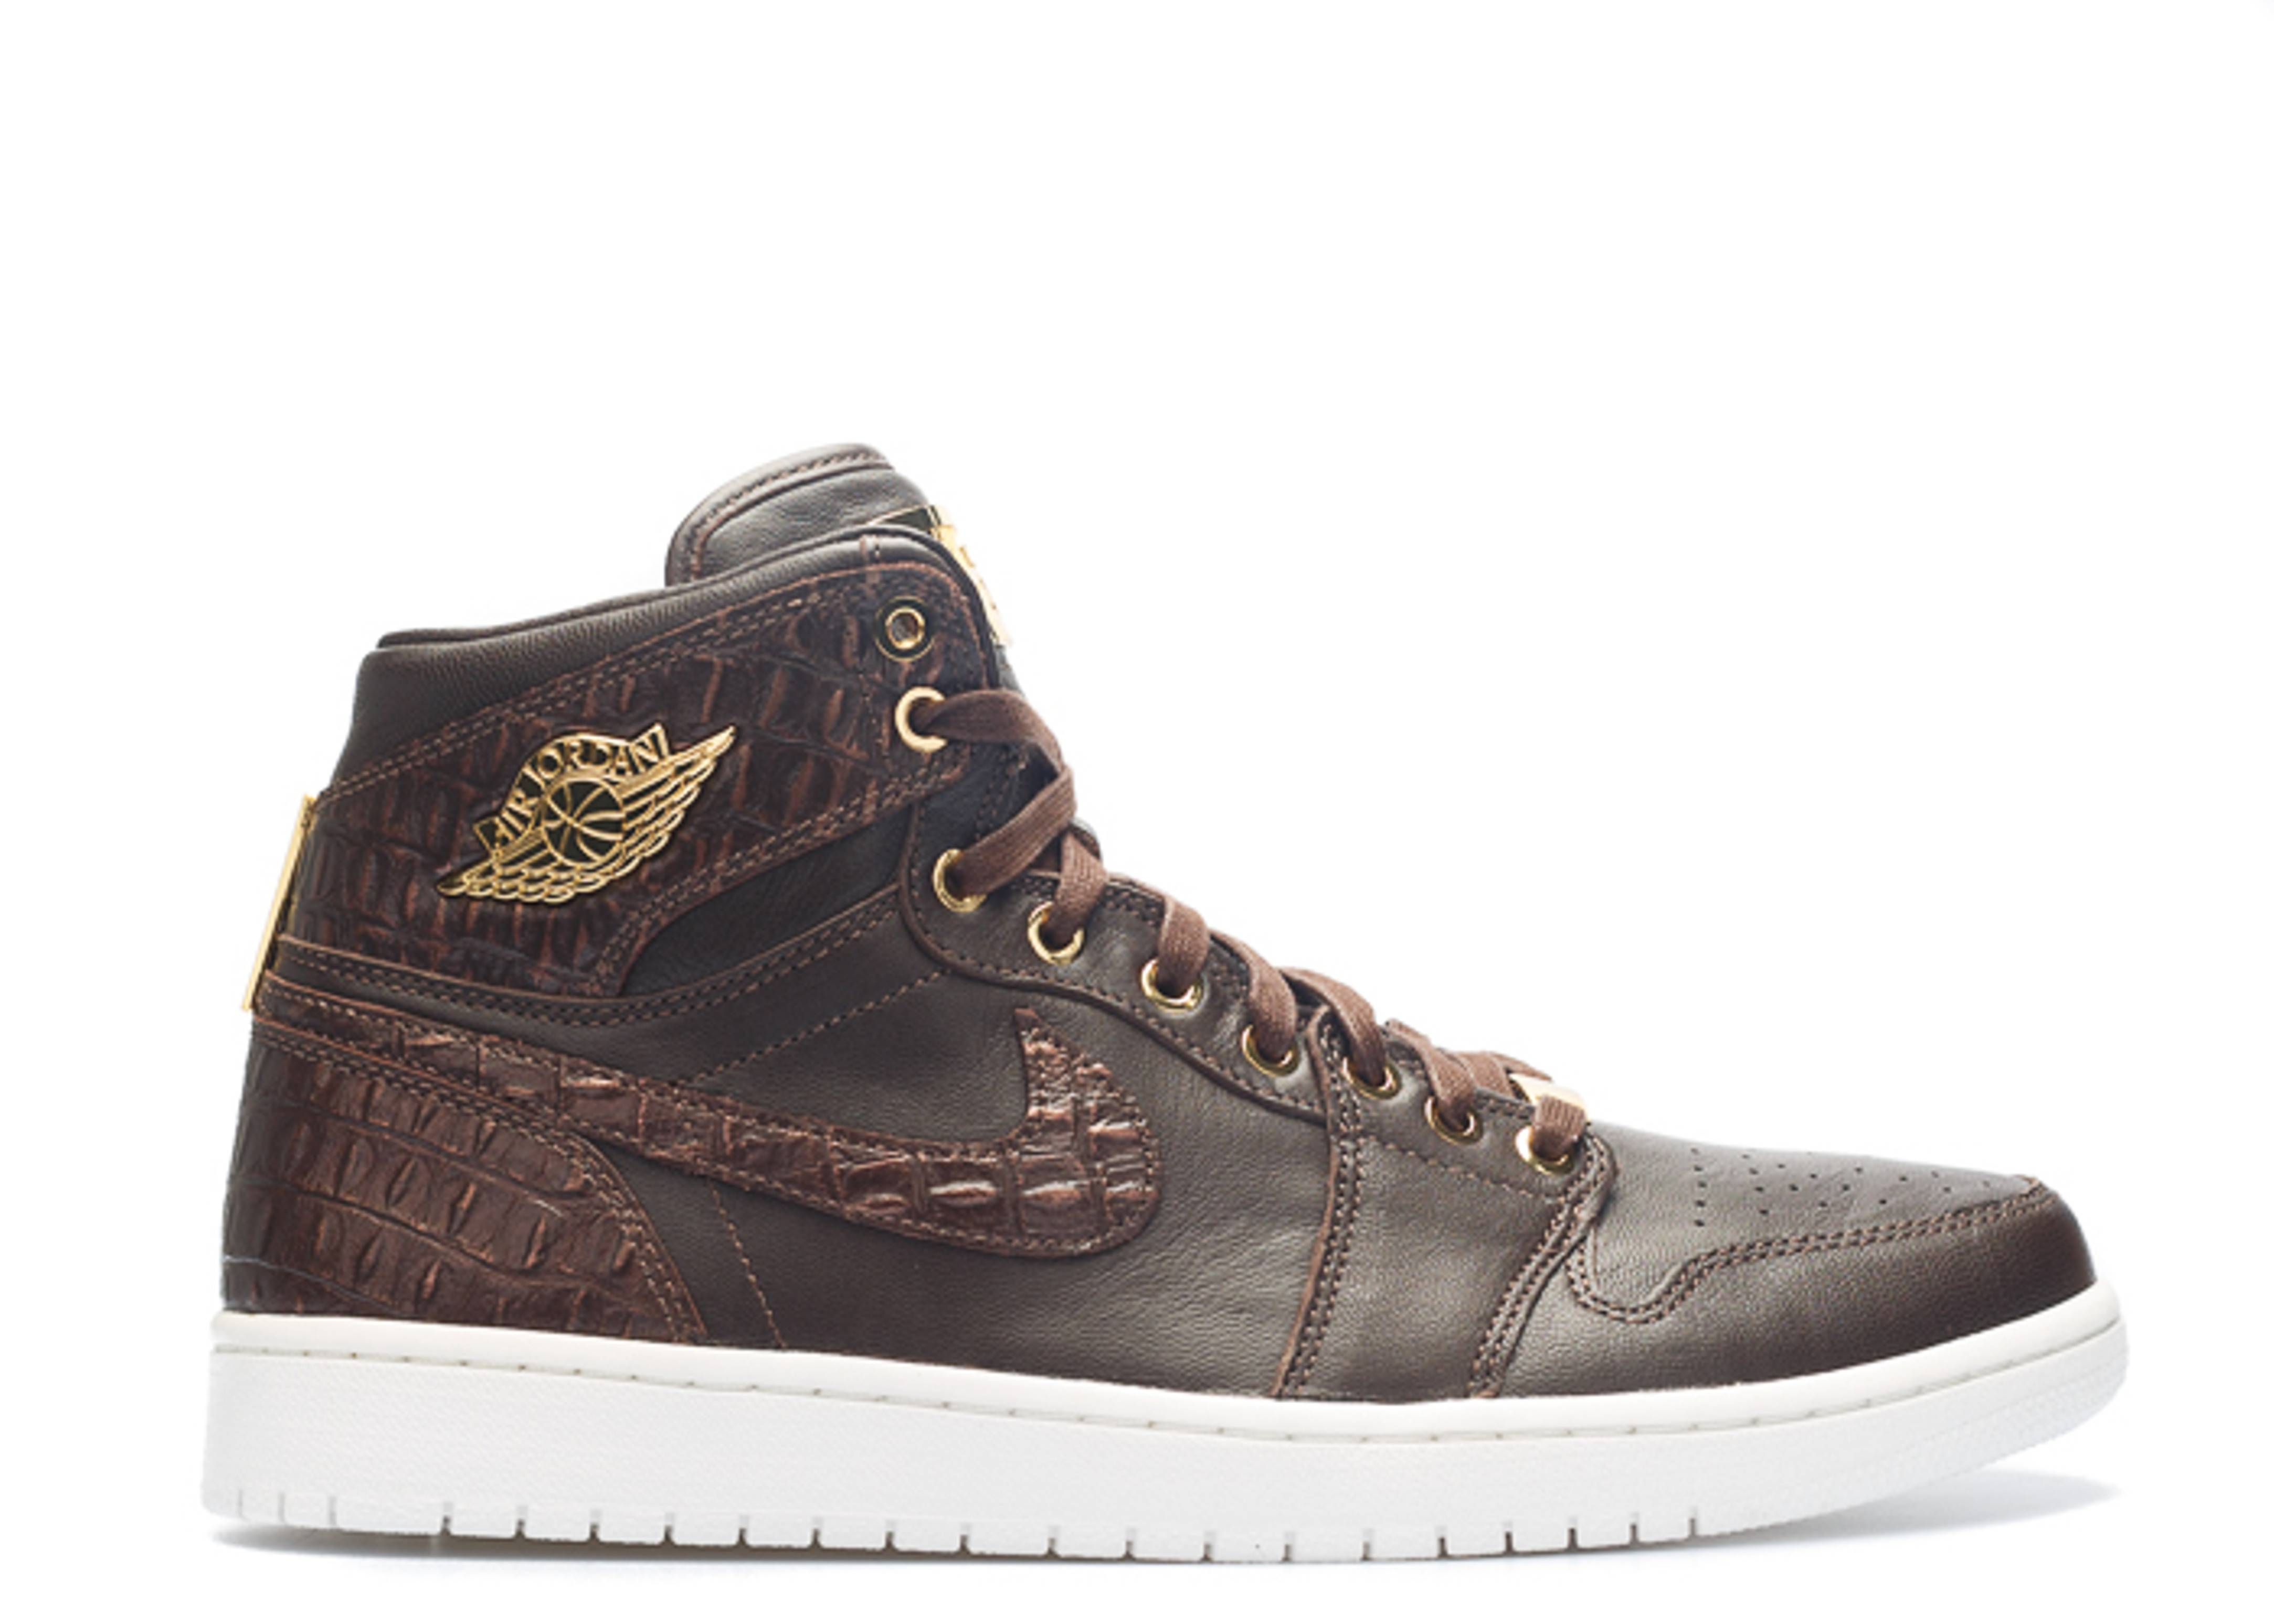 Nike Jordan Pinnacle 1